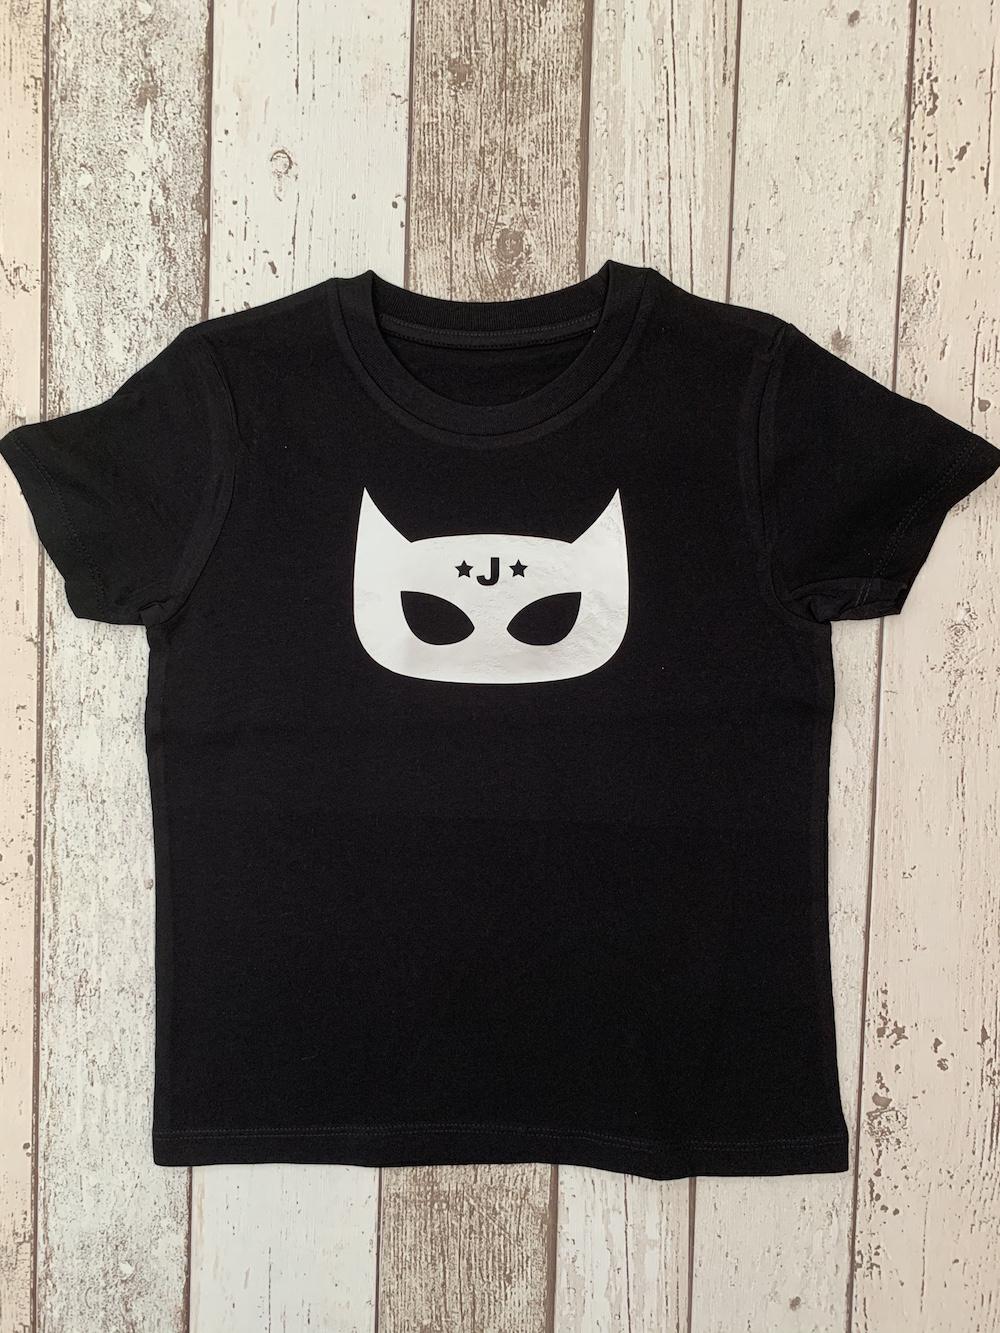 Superhero Personalised Tshirt – Black